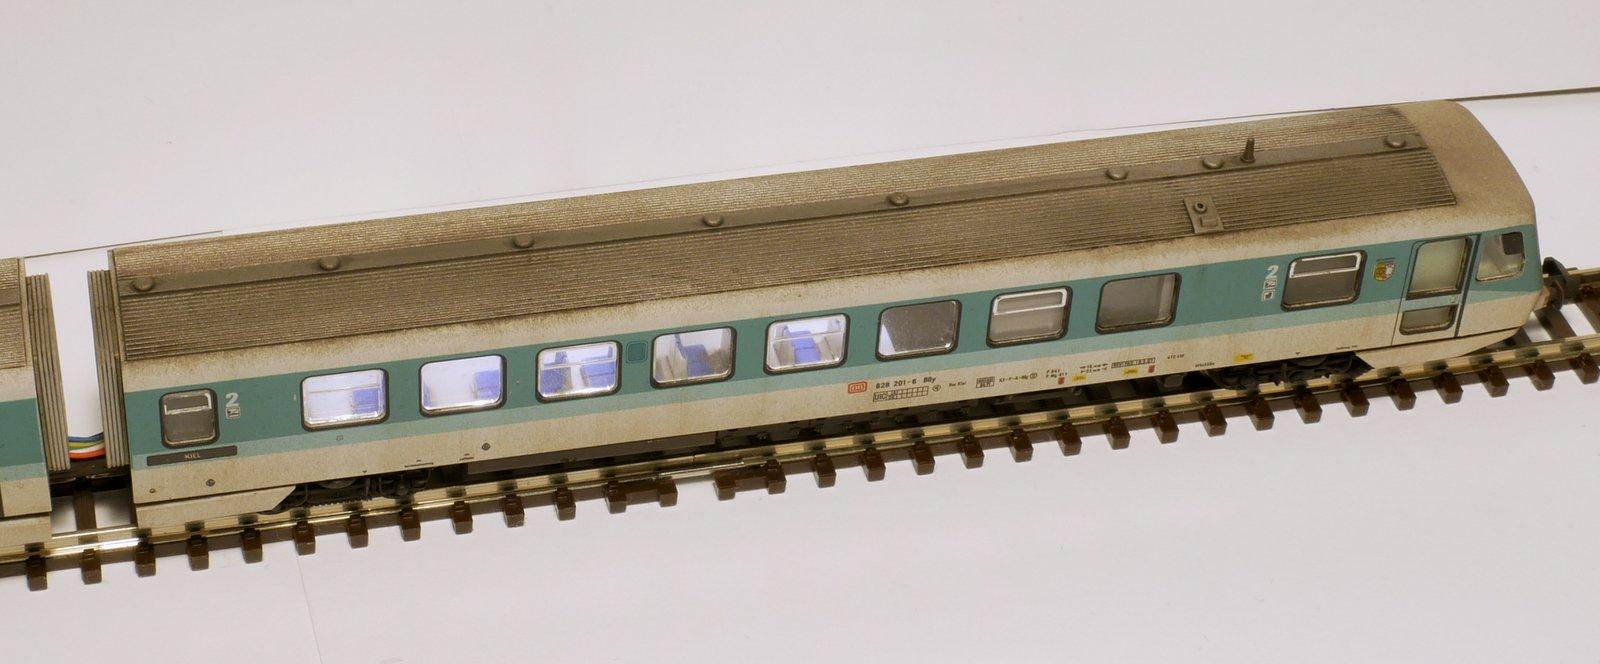 P1140796-001.JPG